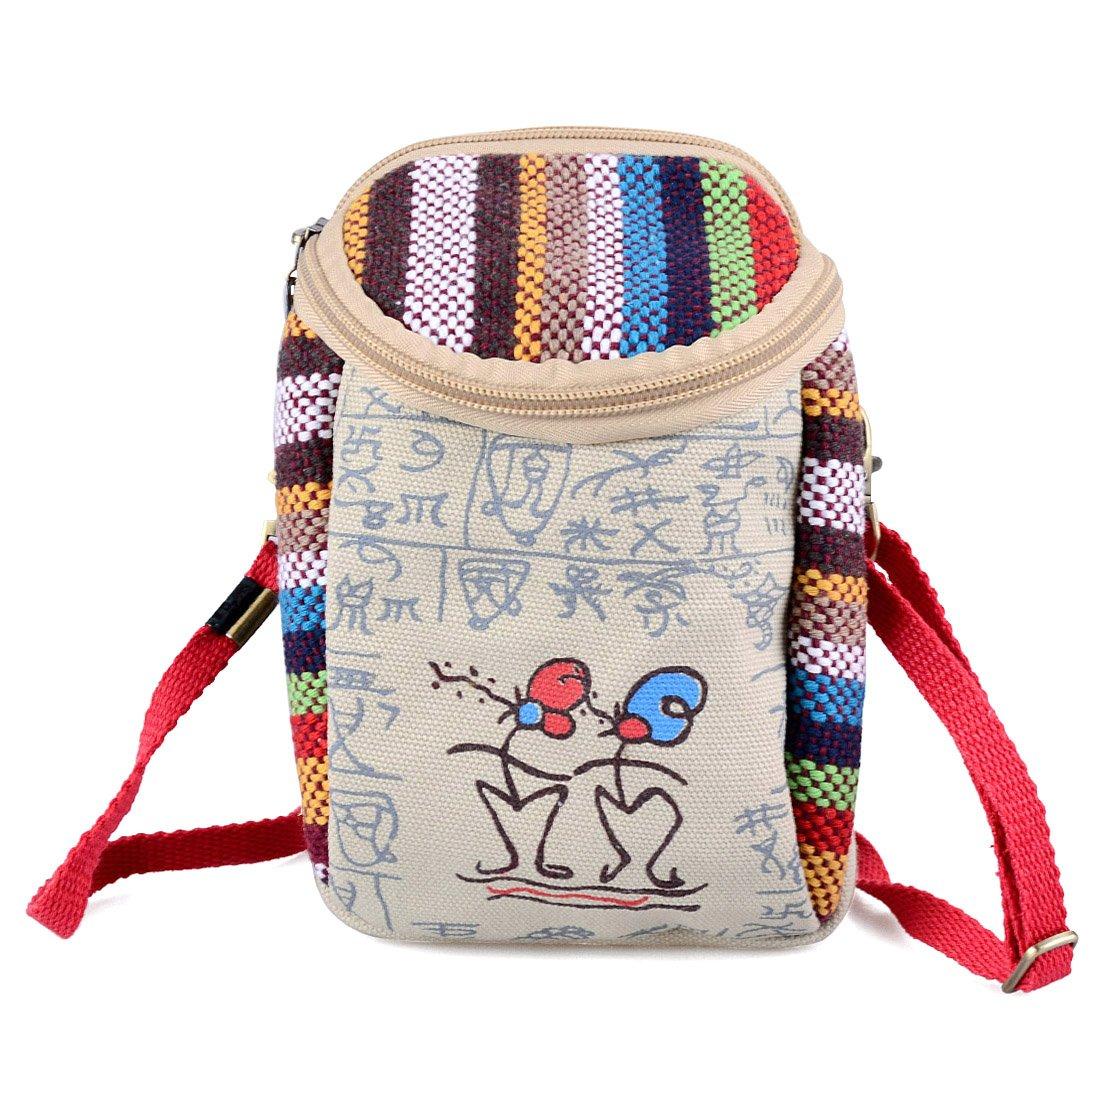 Jiyaru Women Embroidered Purse Cellphone Wallet Crossbody Bag Mini Shoulder Bag Beige